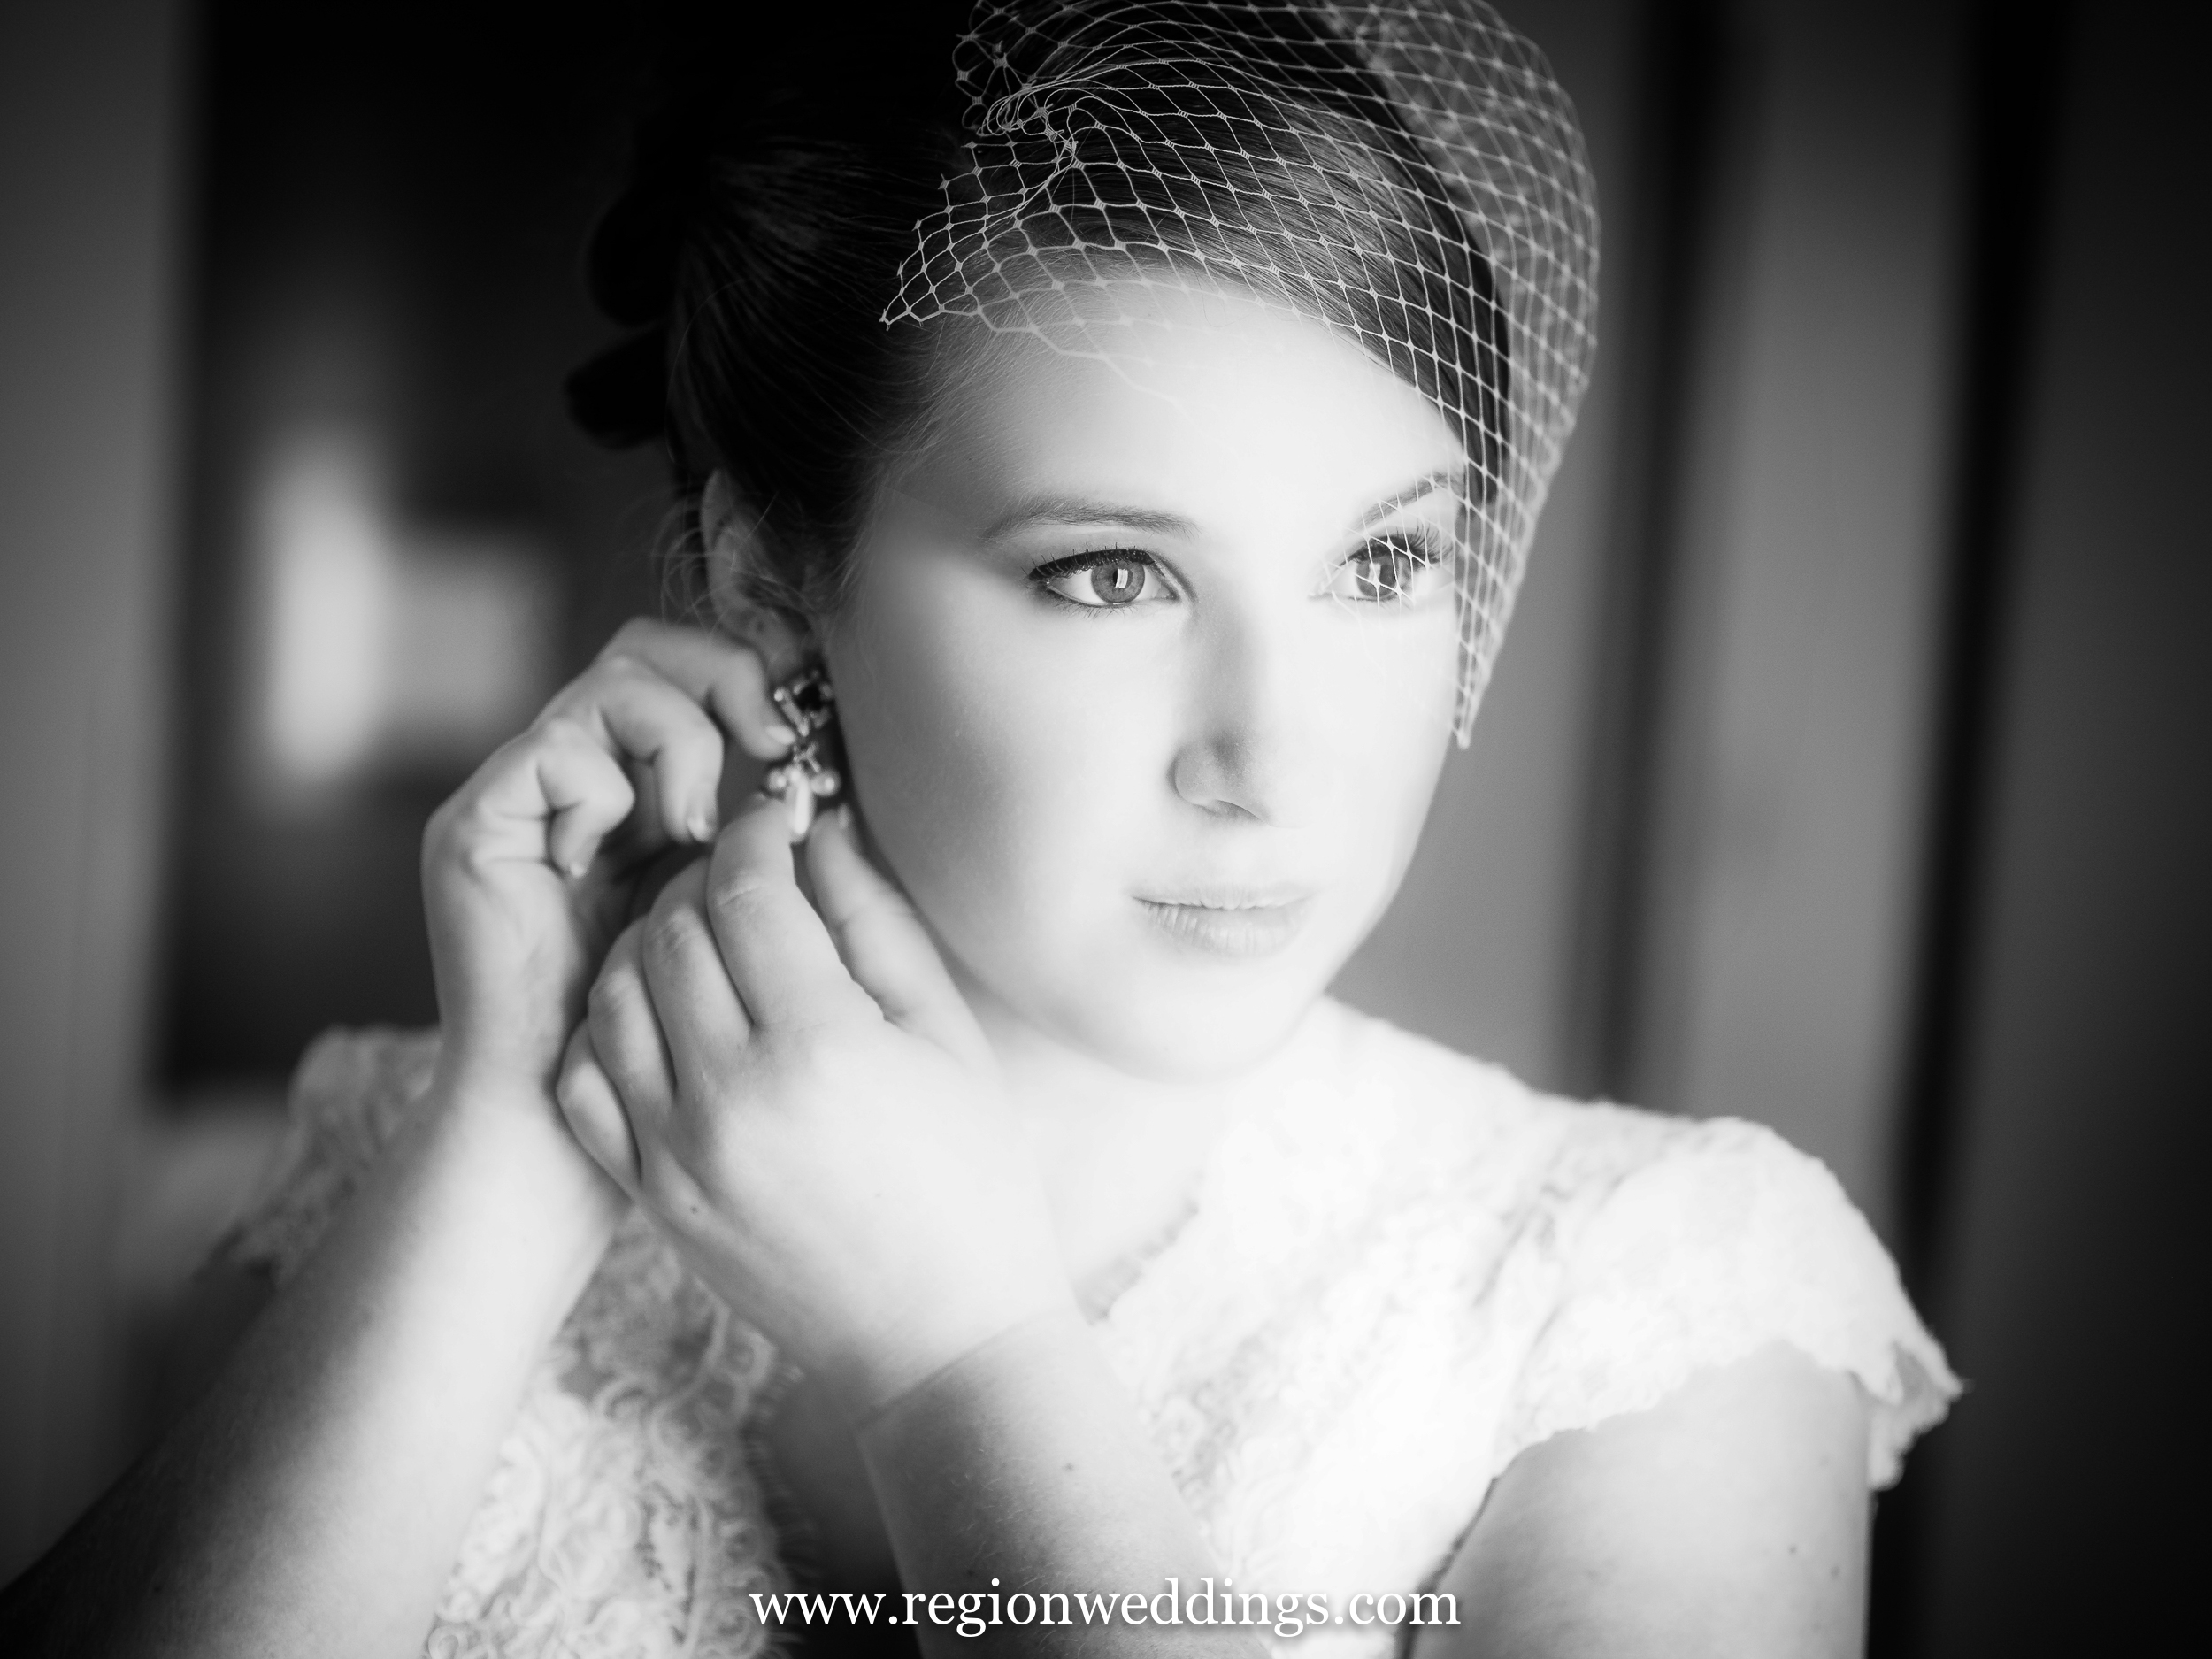 Bride gazes outside a window on her wedding day.